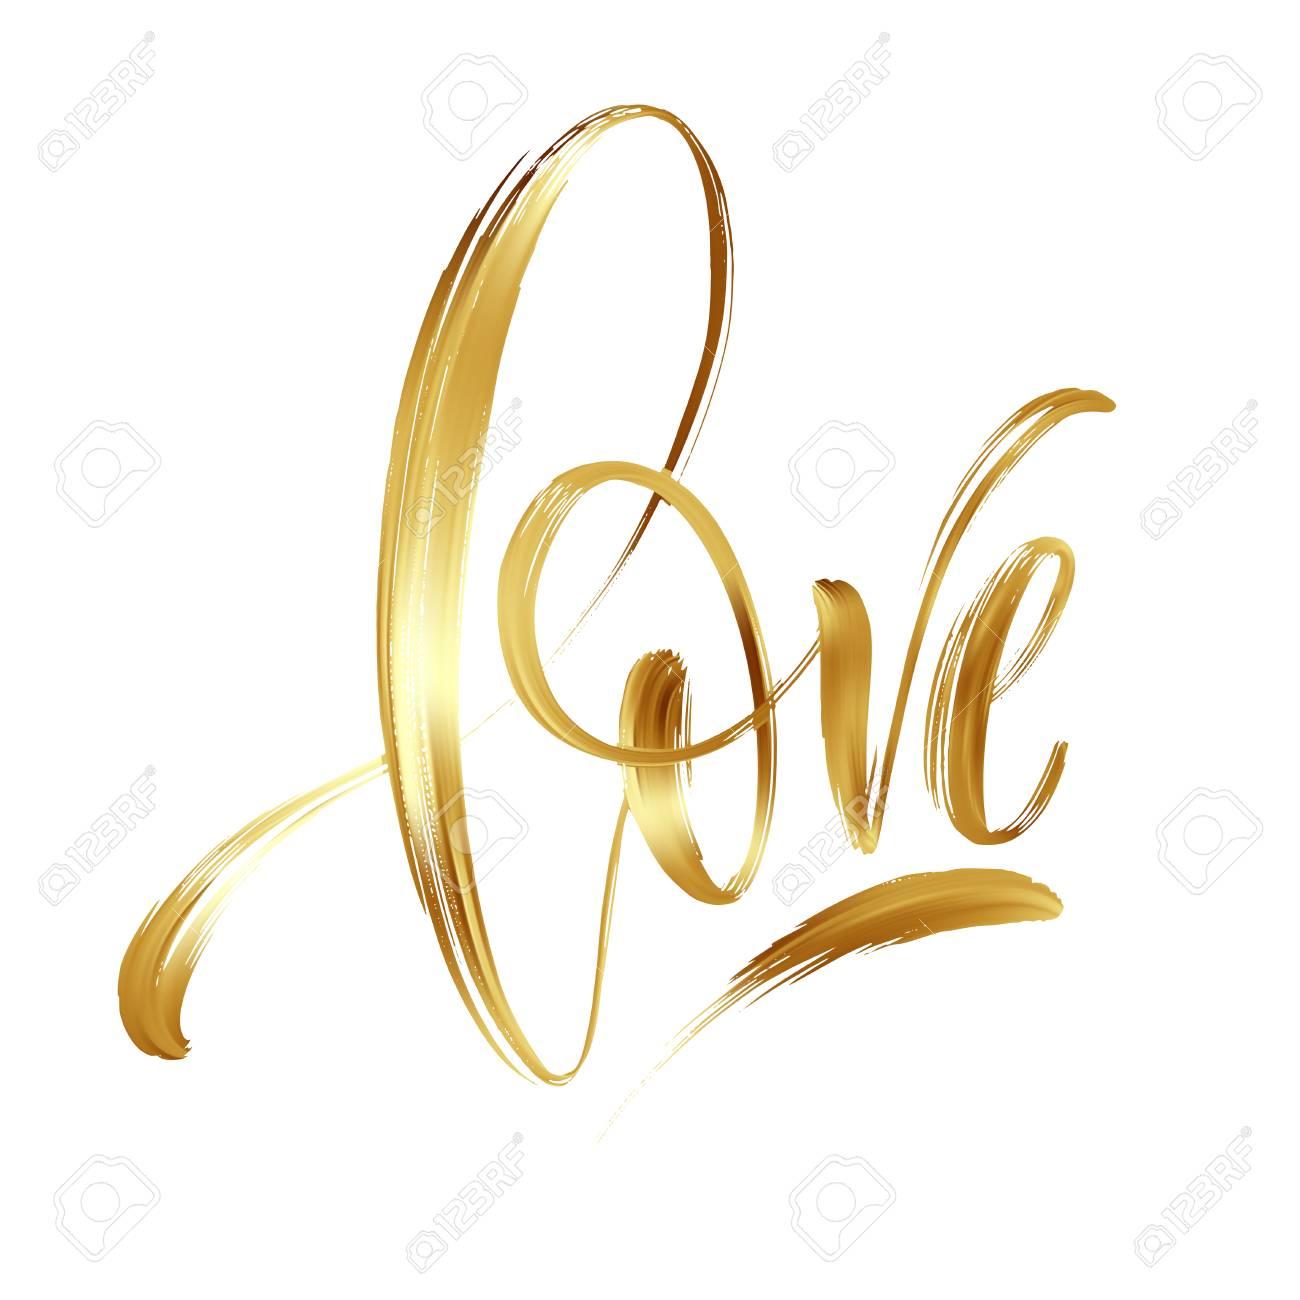 Love gold hand drawn brush calligraphy. Vector illustration - 93128493